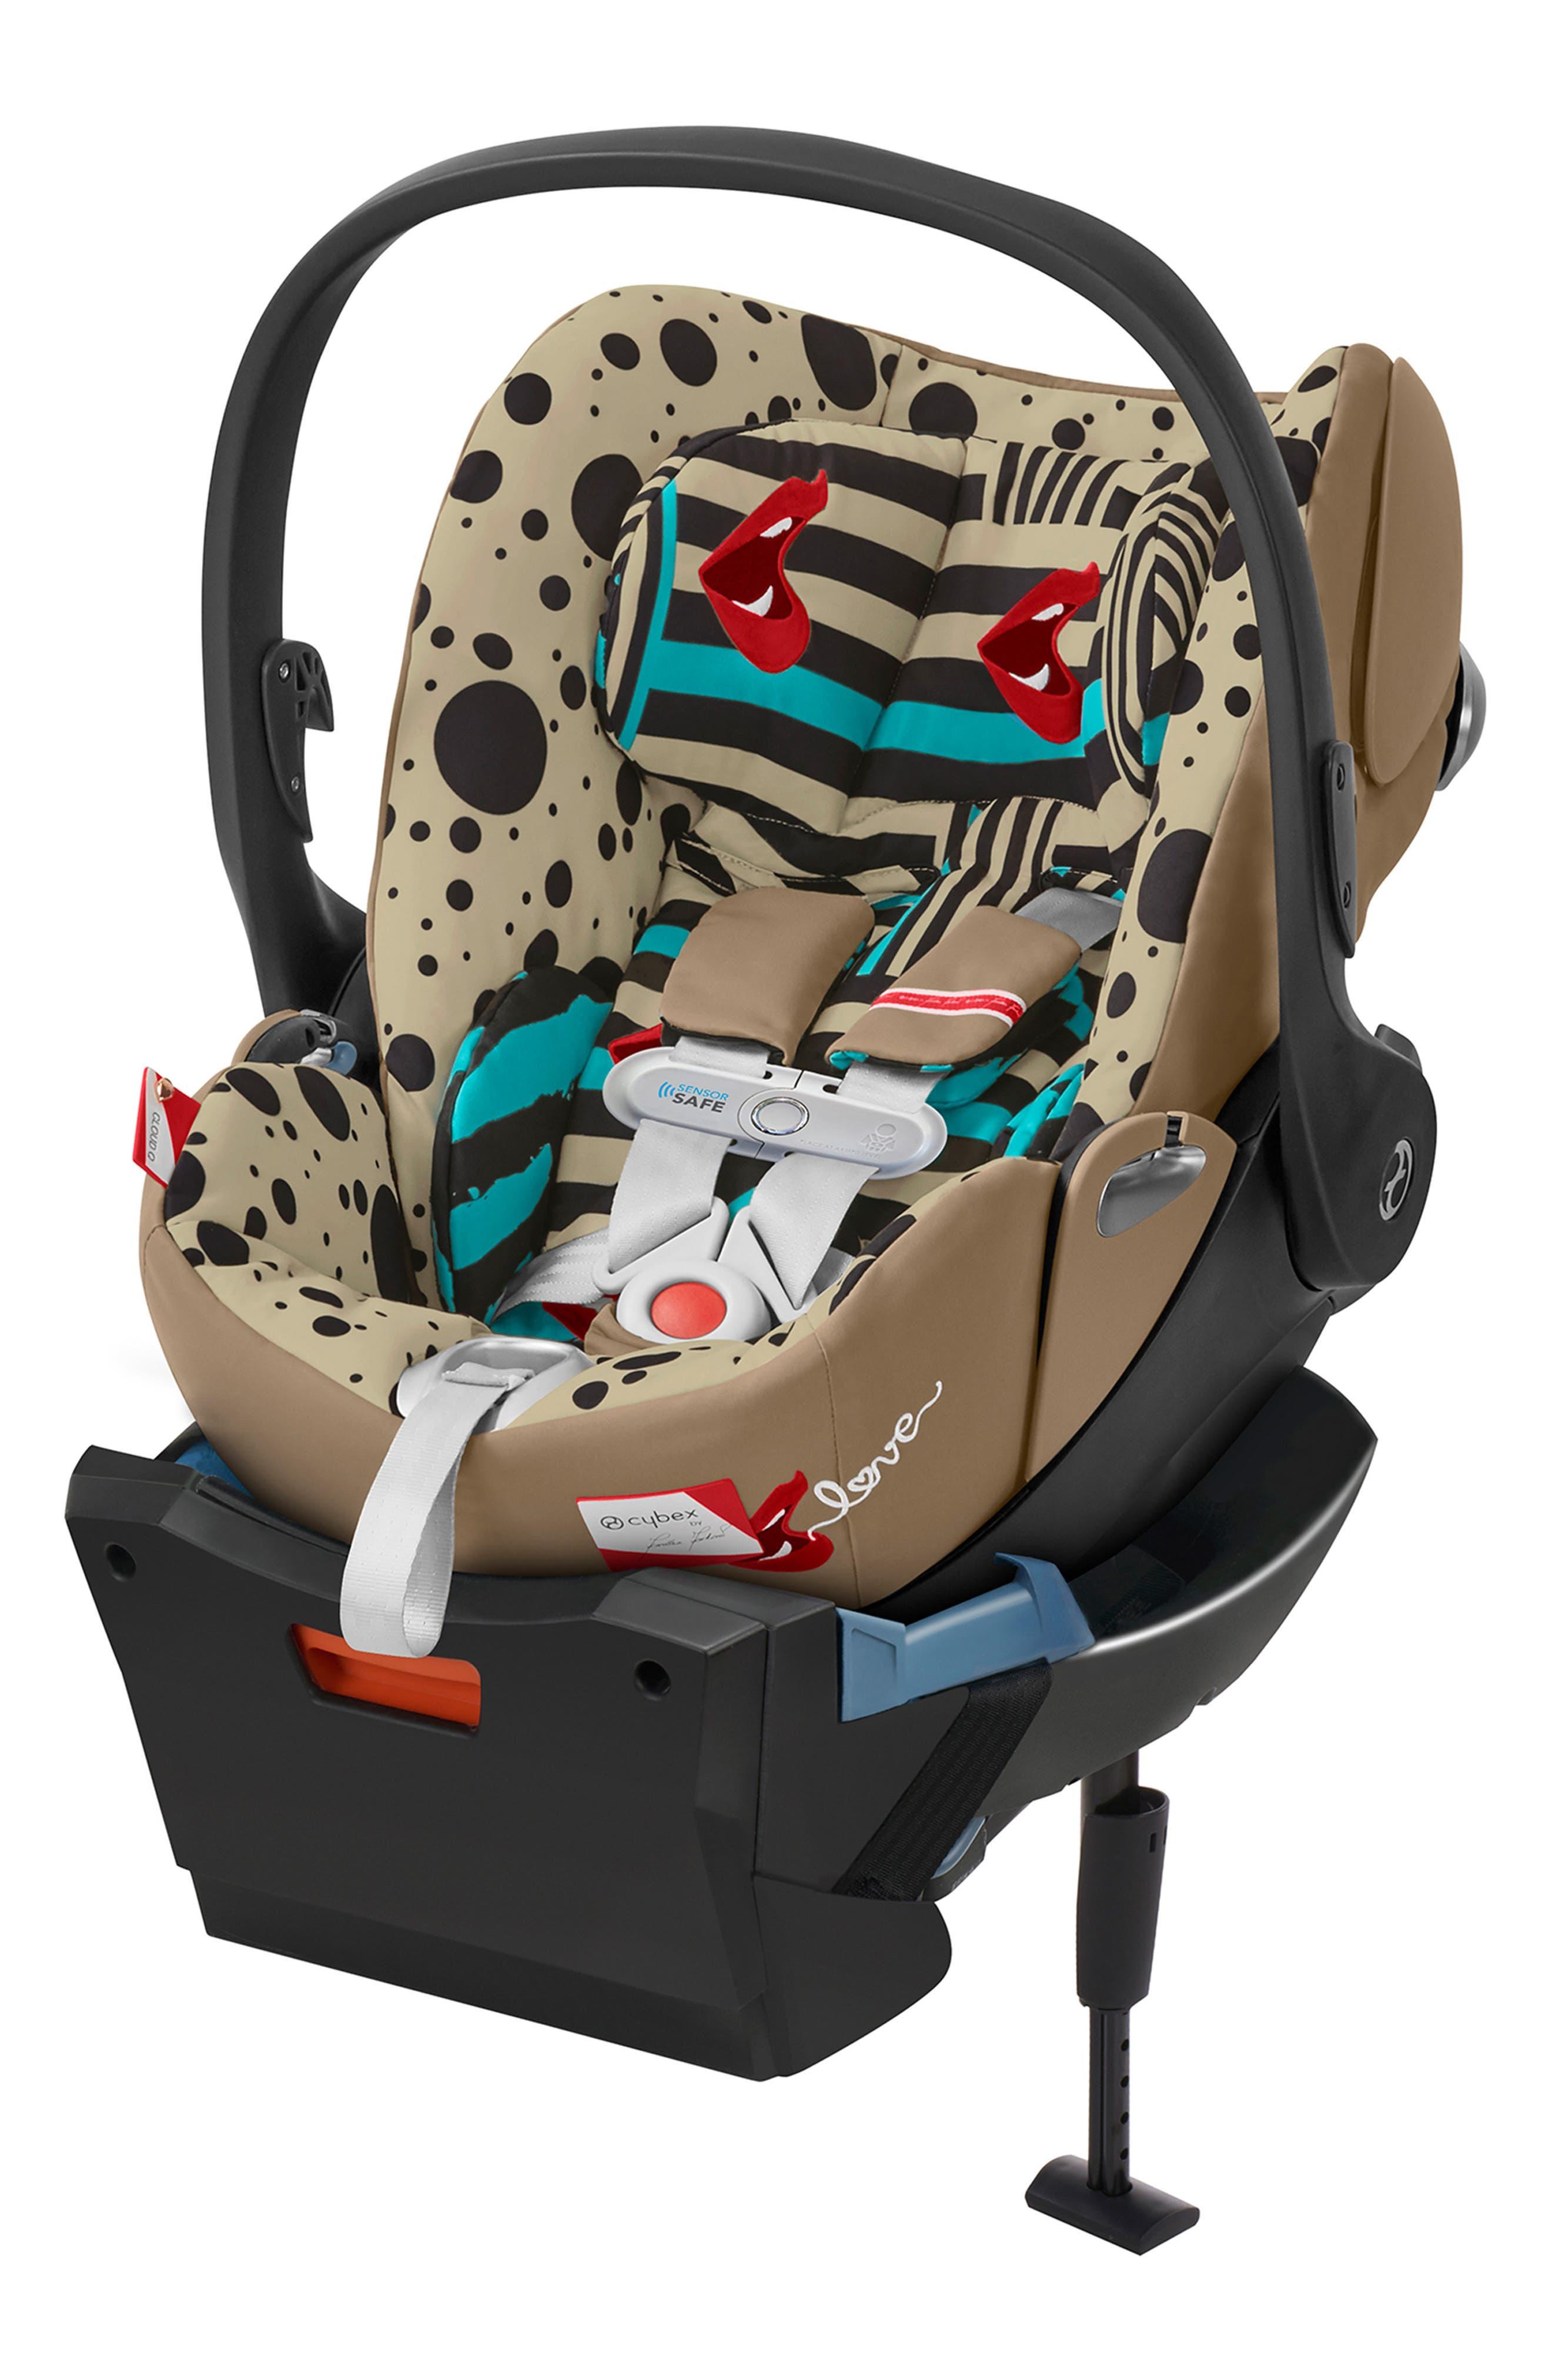 Infant Cybex X Karolina Kurkova Cloud Q Infant Car Seat  Base